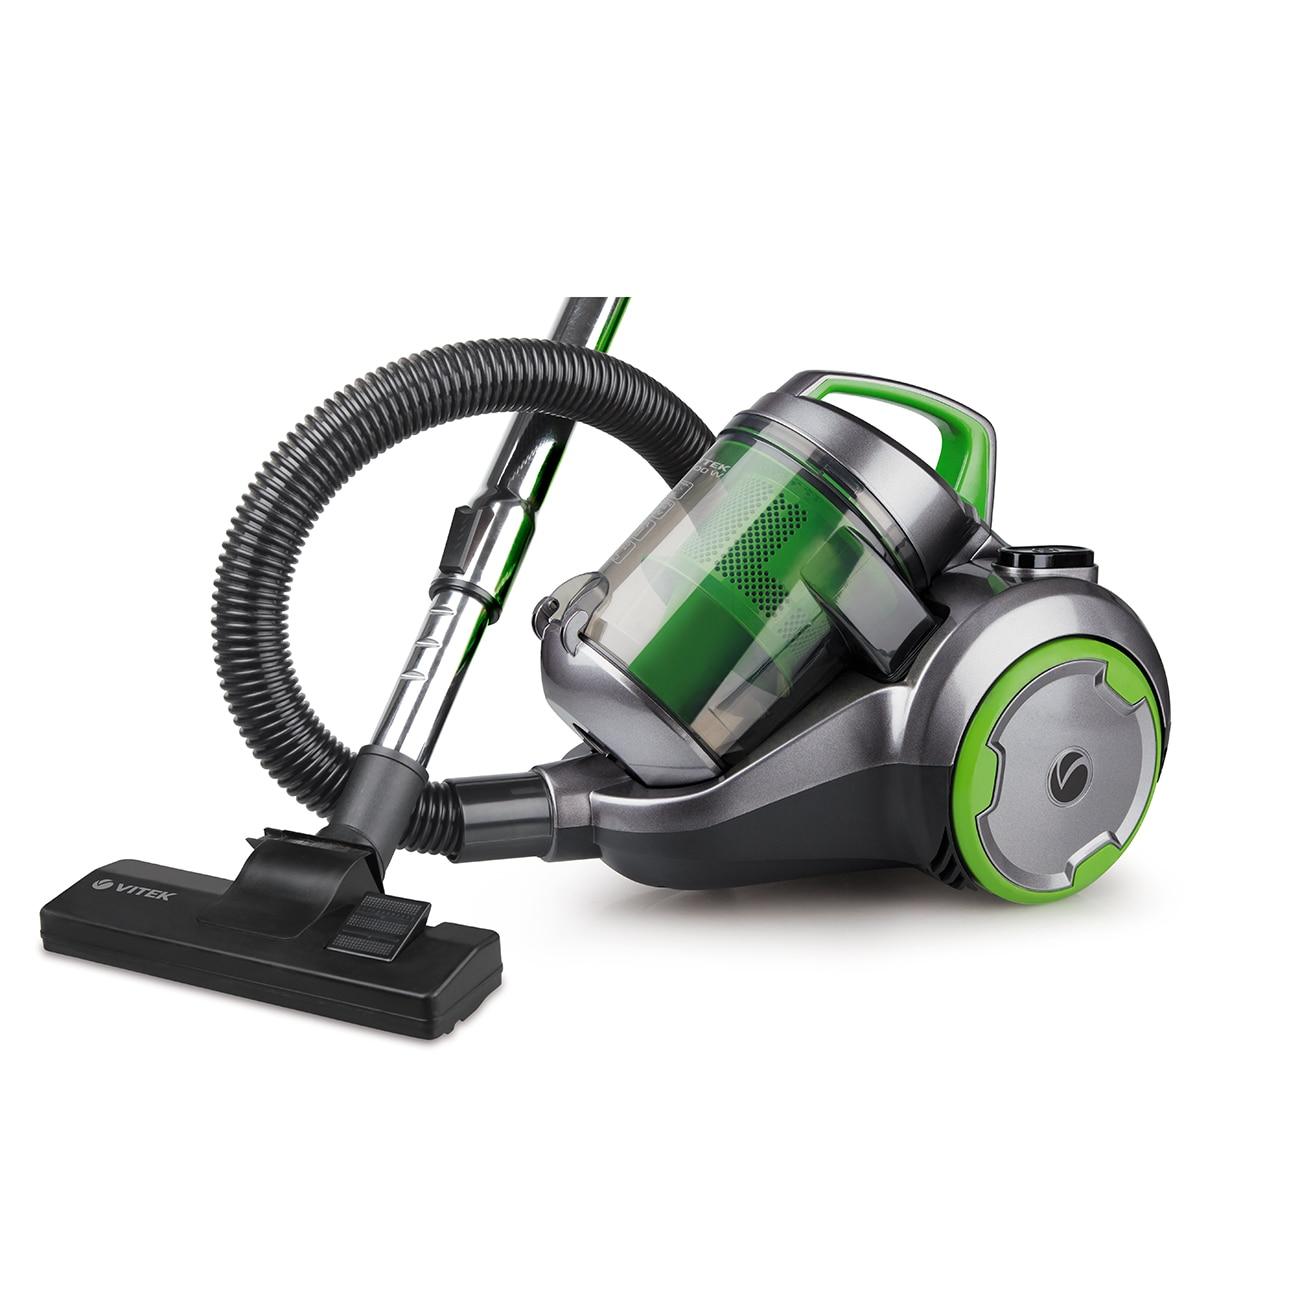 Electric vacuum cleaner Vitek VT-1894 G long uv lamp of wp601 accessories of vacuum cleaner